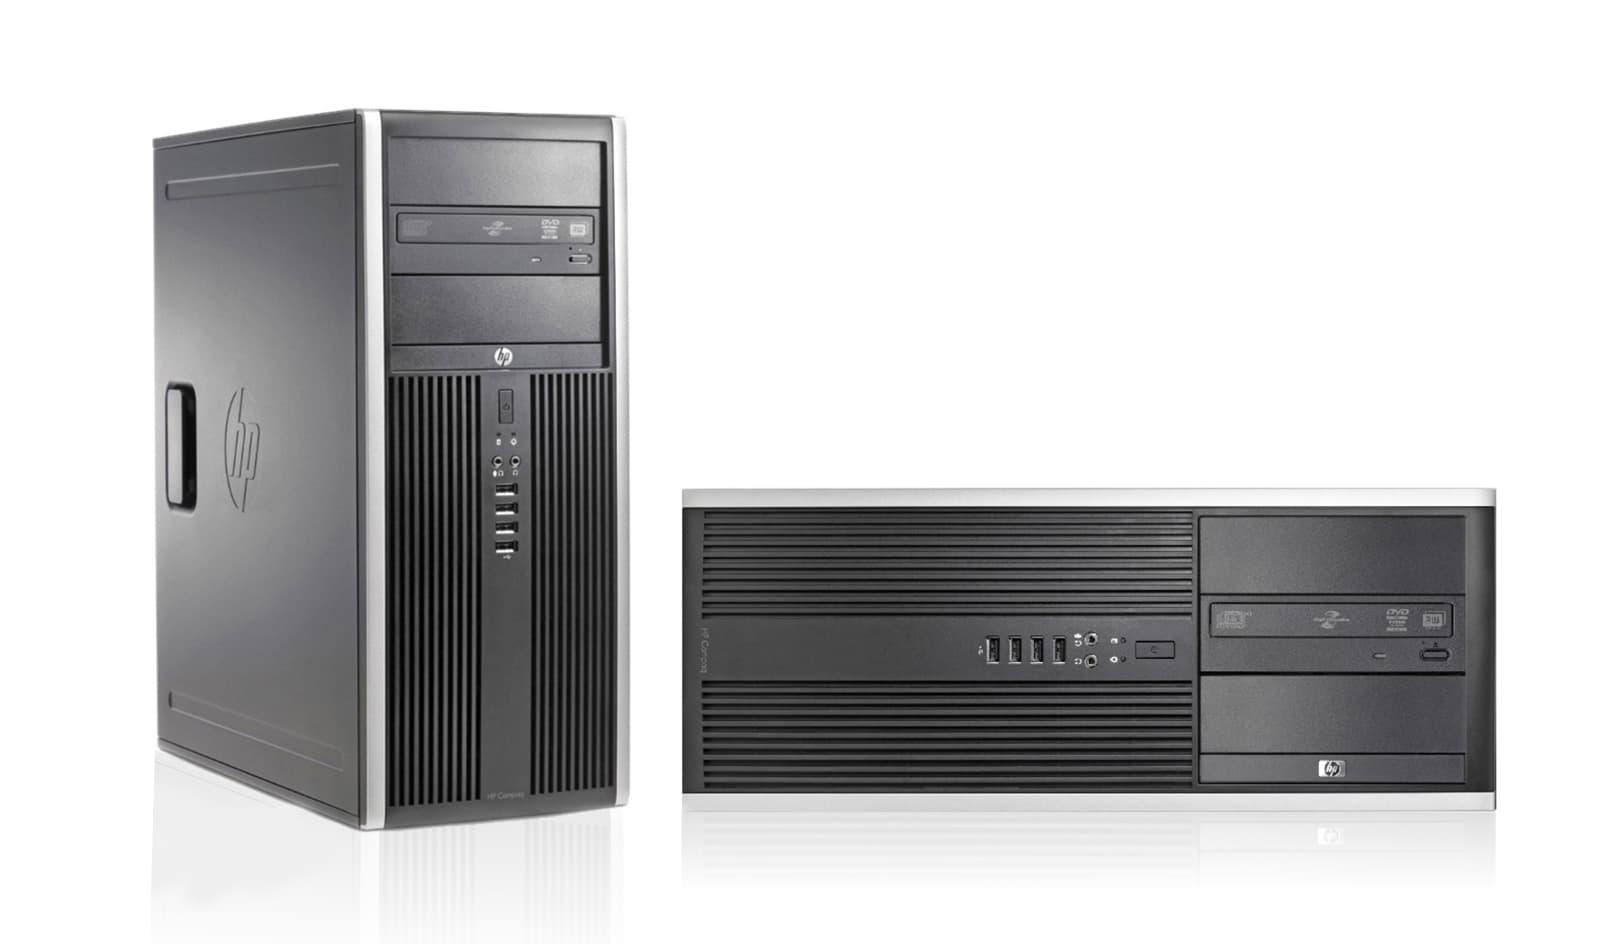 Refurbished PC HP SQR PC 8300 Elite CMT Intel i5 3.60GHz με Δίσκο SSD 240GB